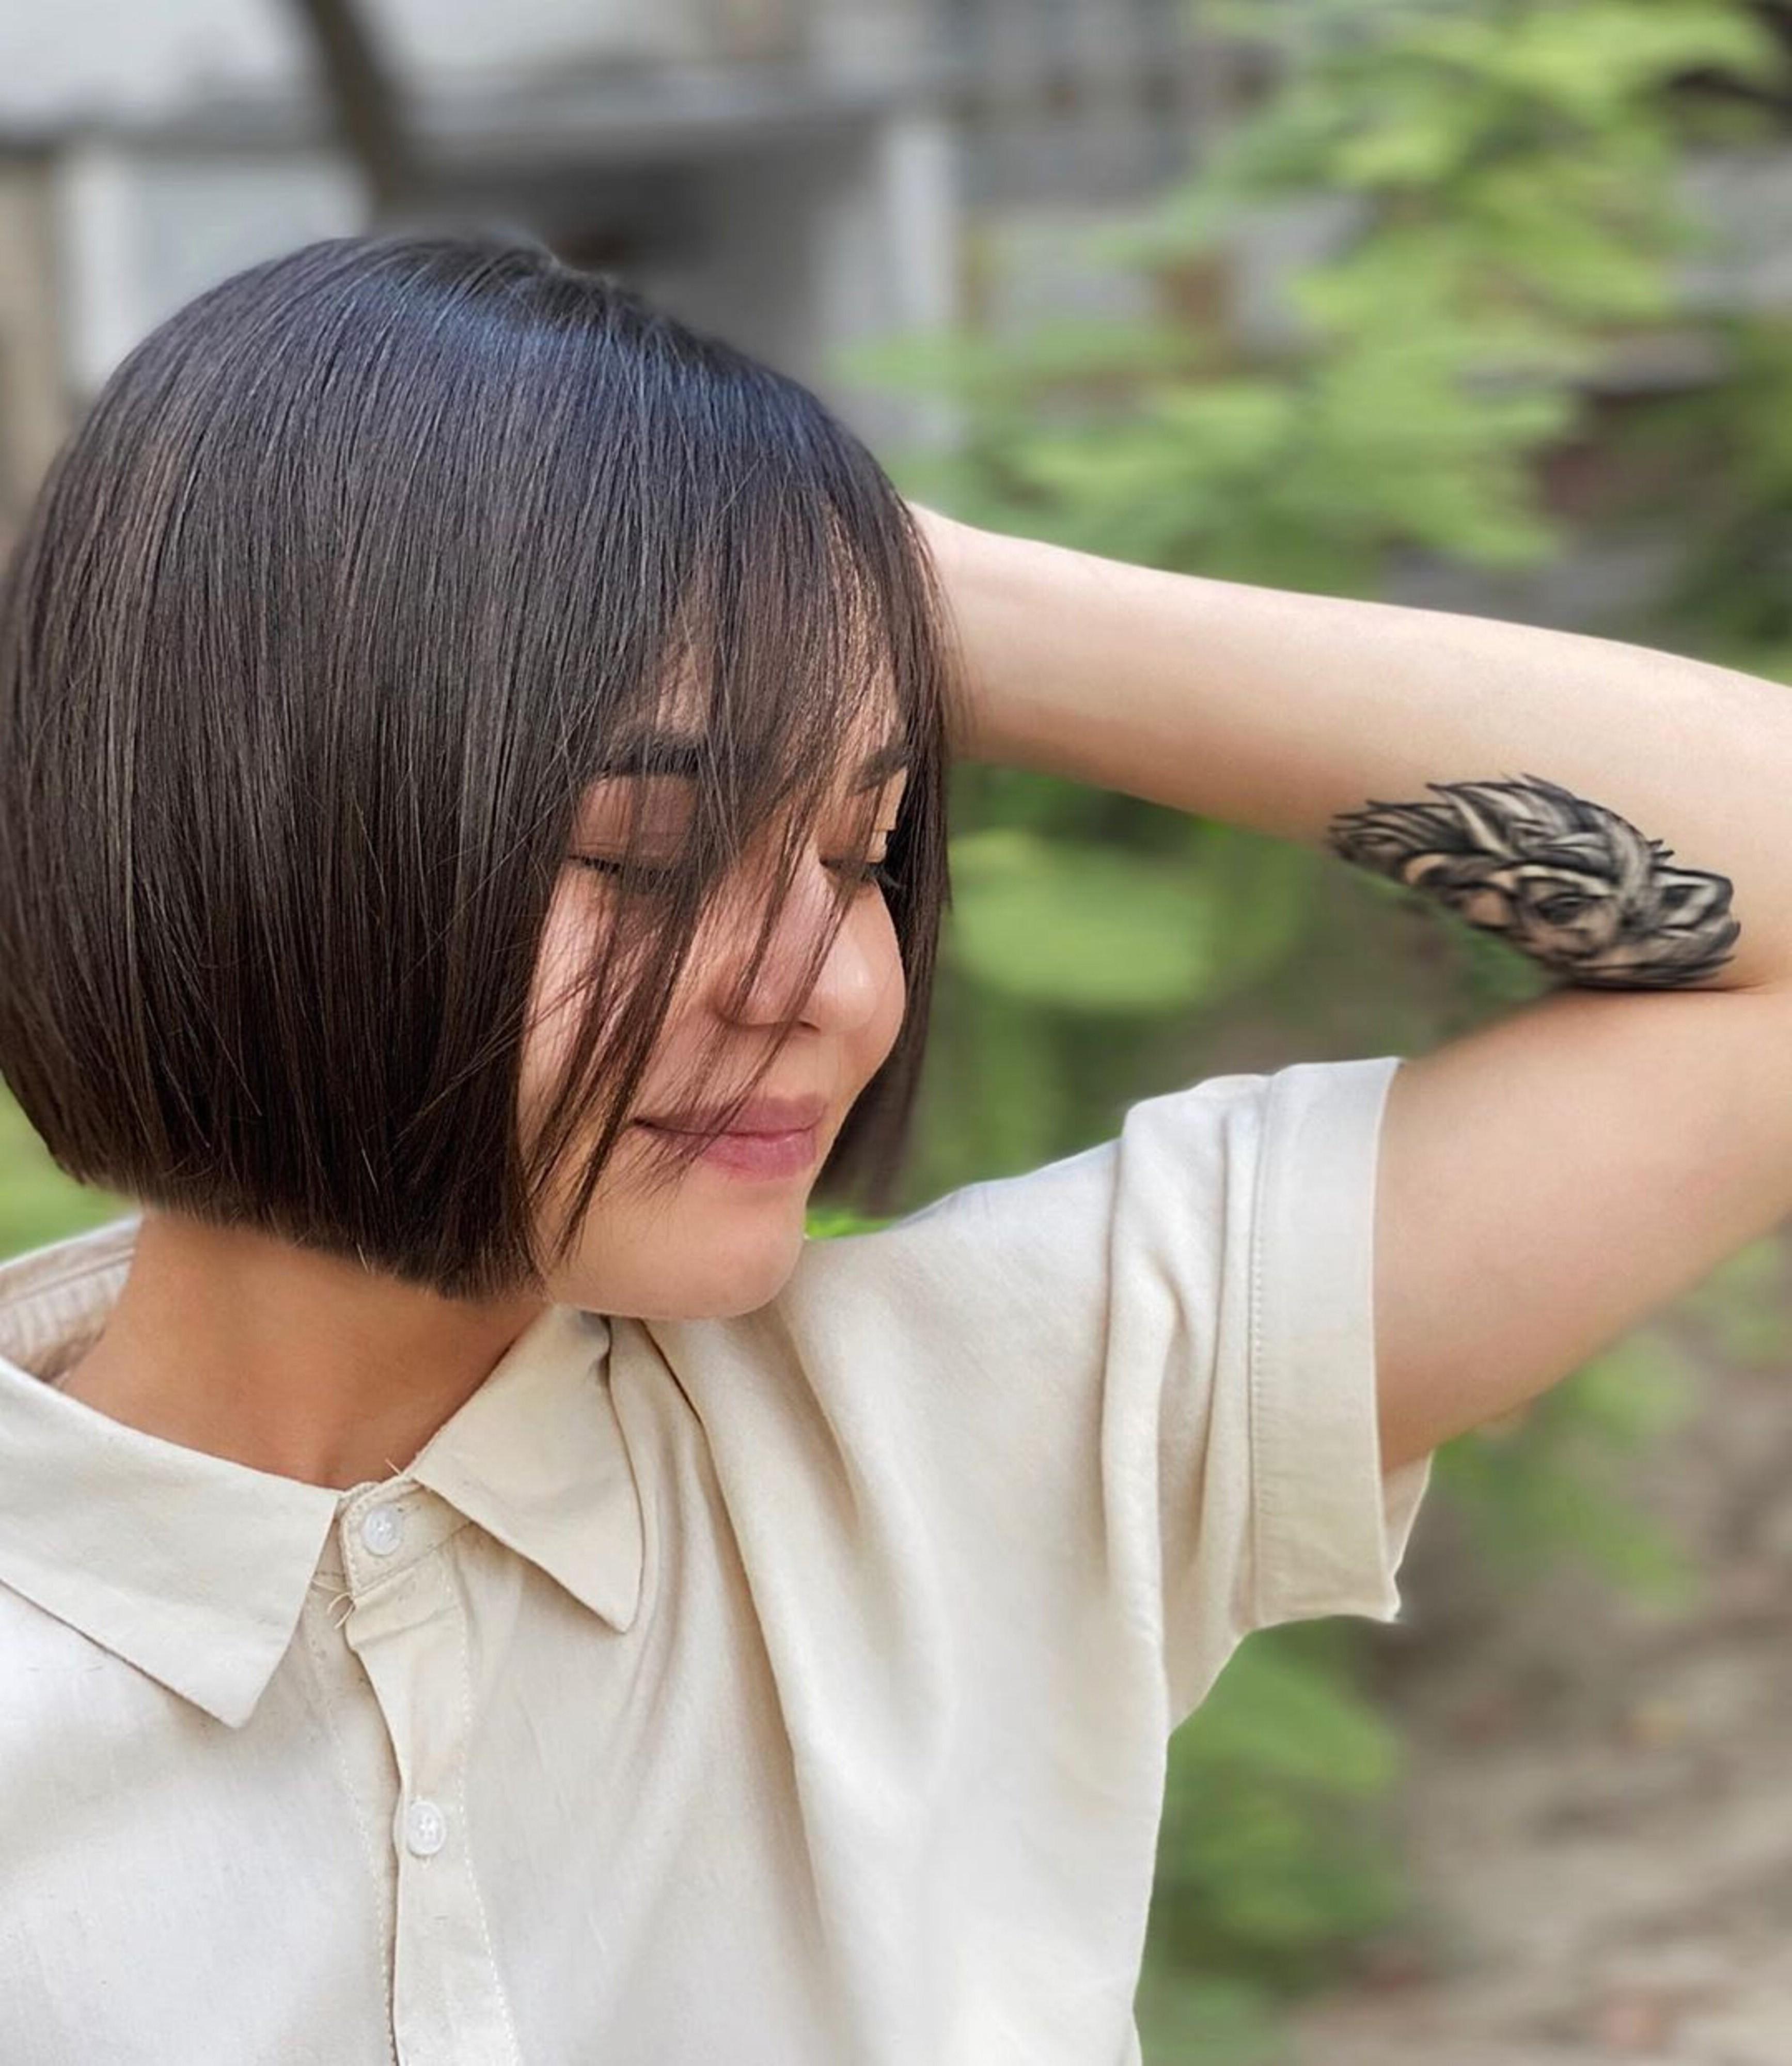 Chin-length bob hair cut.